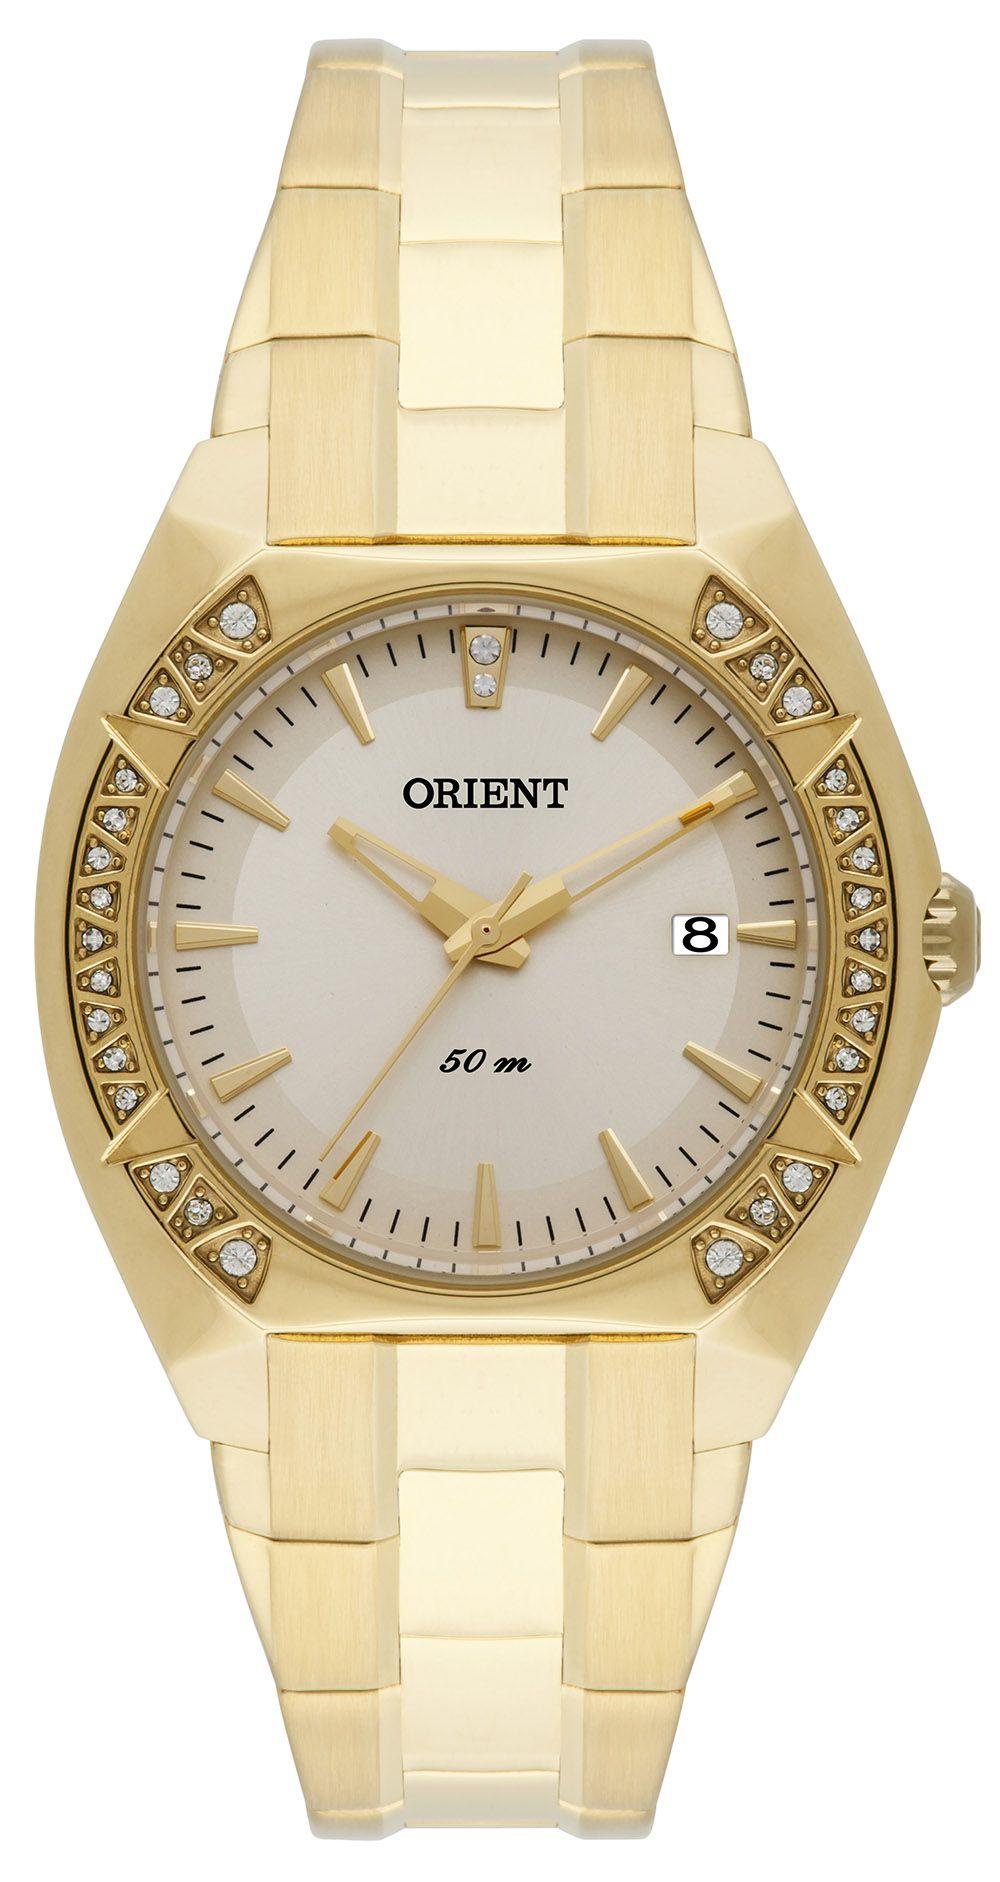 Relógio Feminino Casual Dourado FGSS1111-C1KX Orient